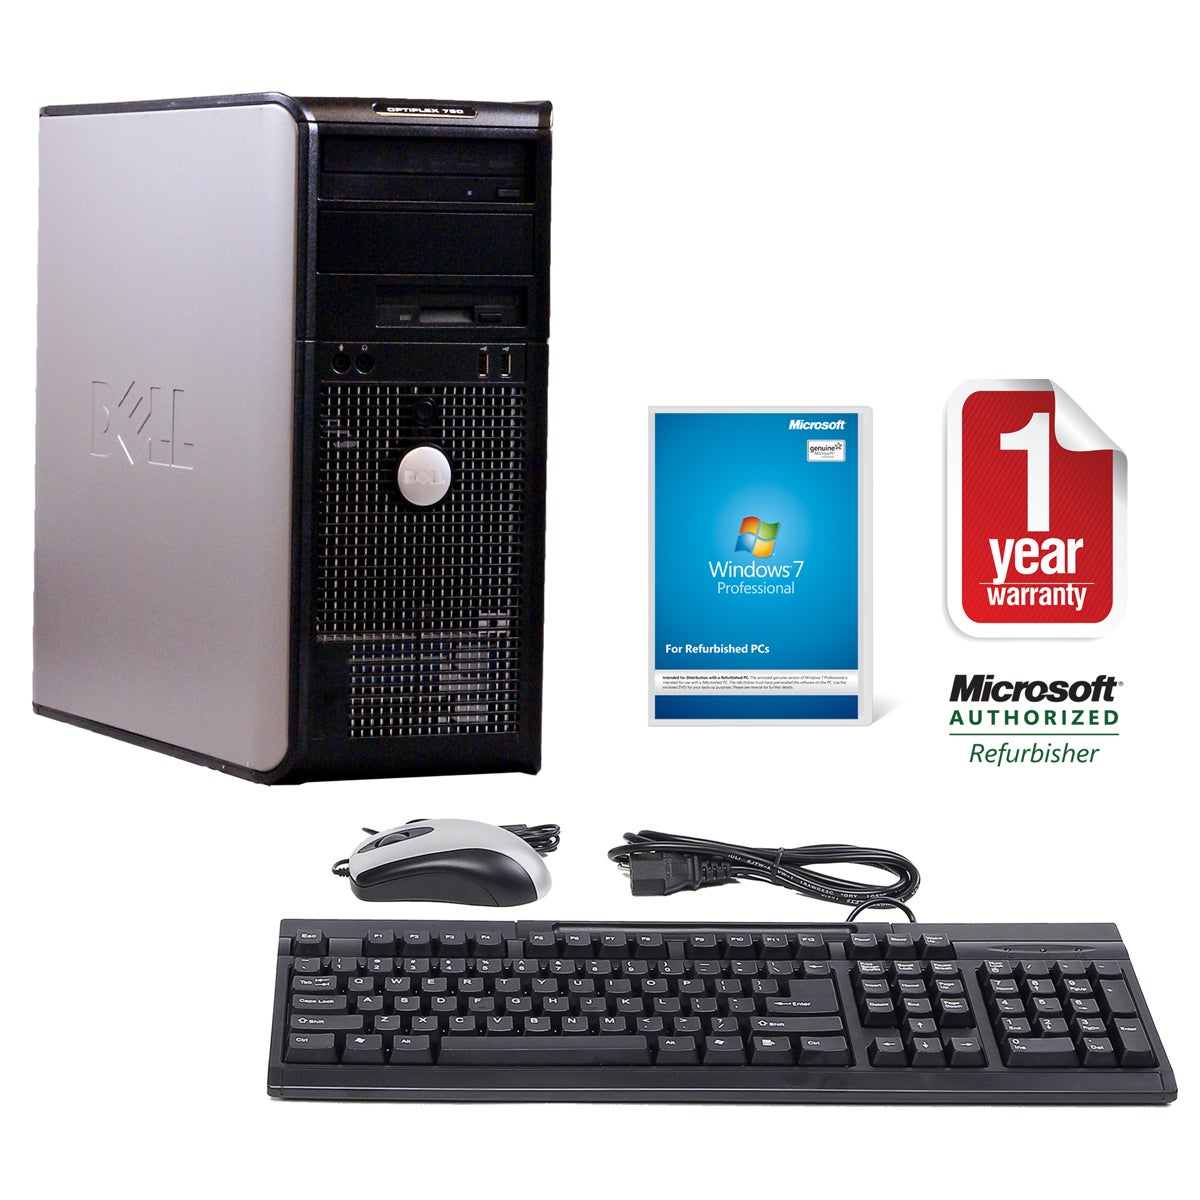 Dell OptiPlex 760 2.4GHz 500GB MT Computer (Refurbished)